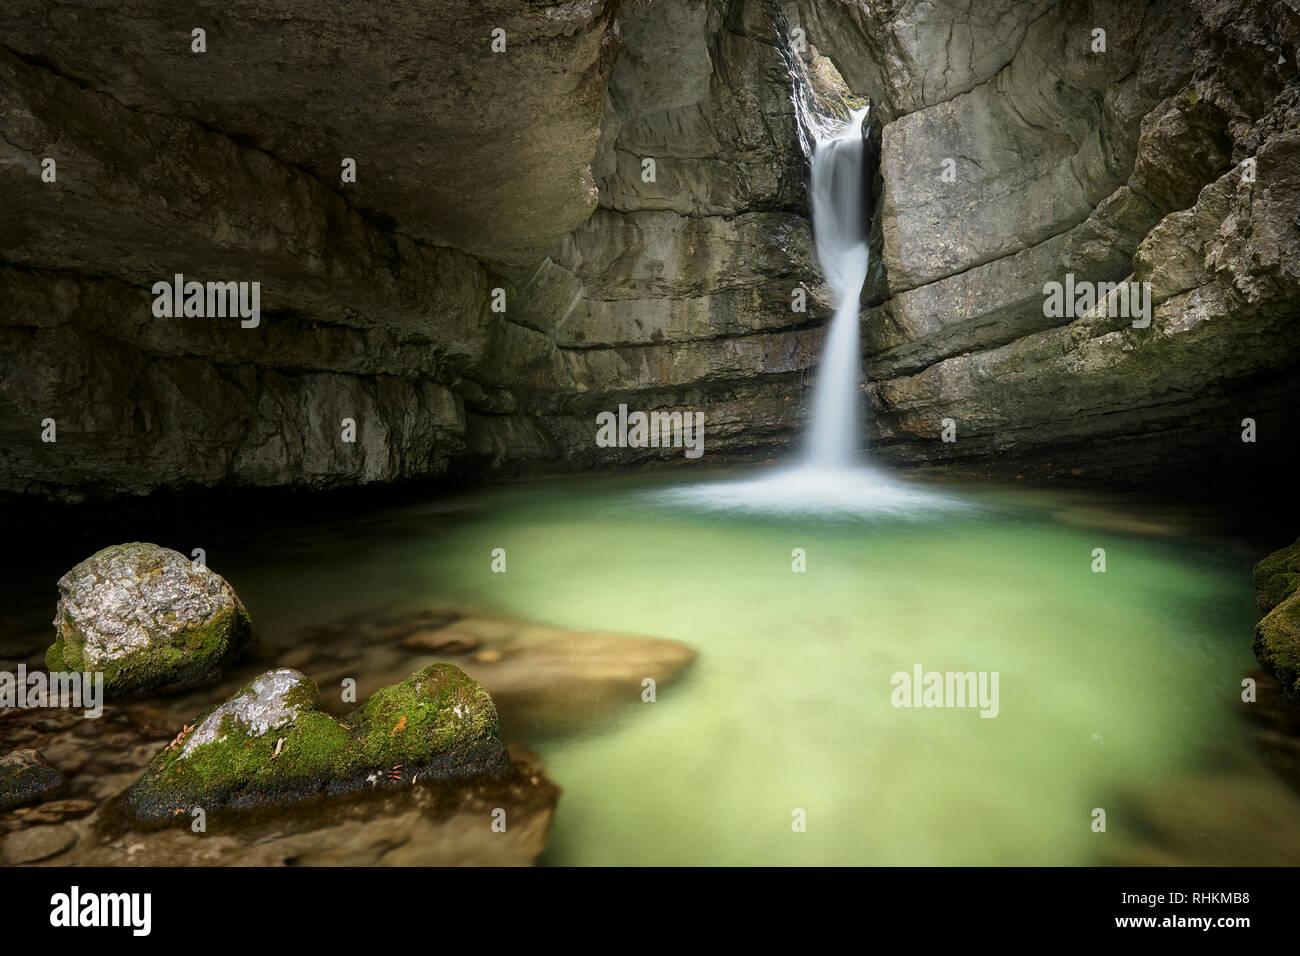 Torrente Boite, near Cortina d'Ampezzo, Dolomites, Veneto, Italy.  Waterfall in a cave. - Stock Image